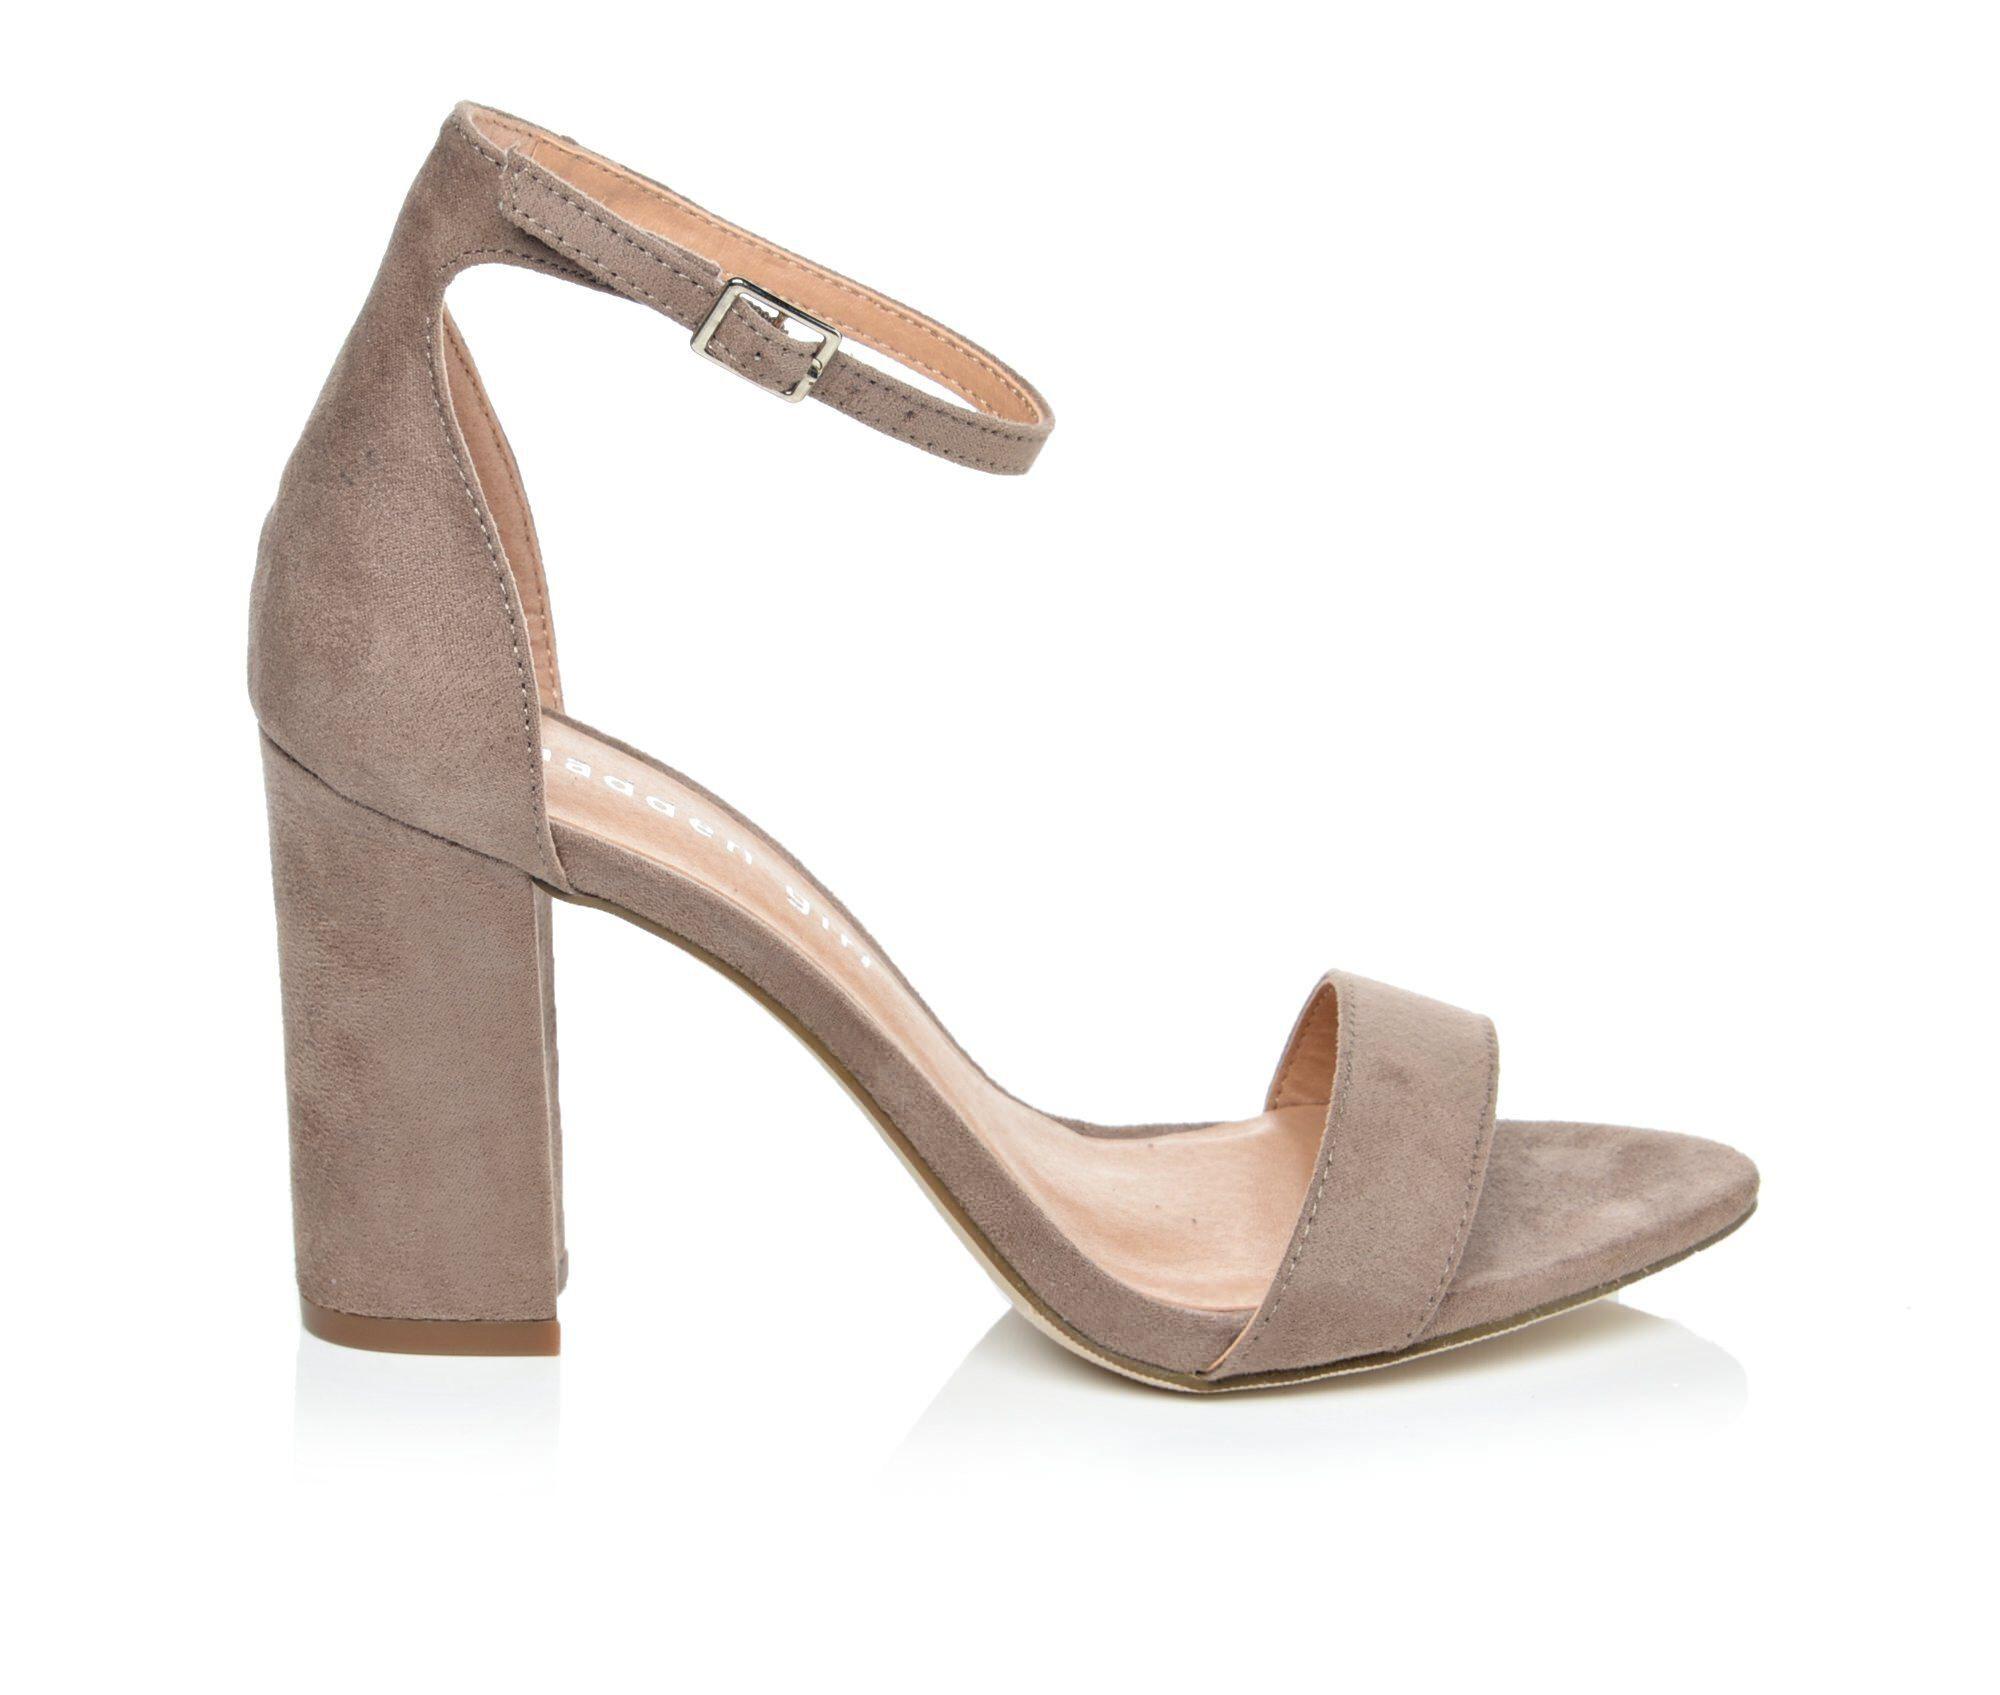 Bone colored dress sandals